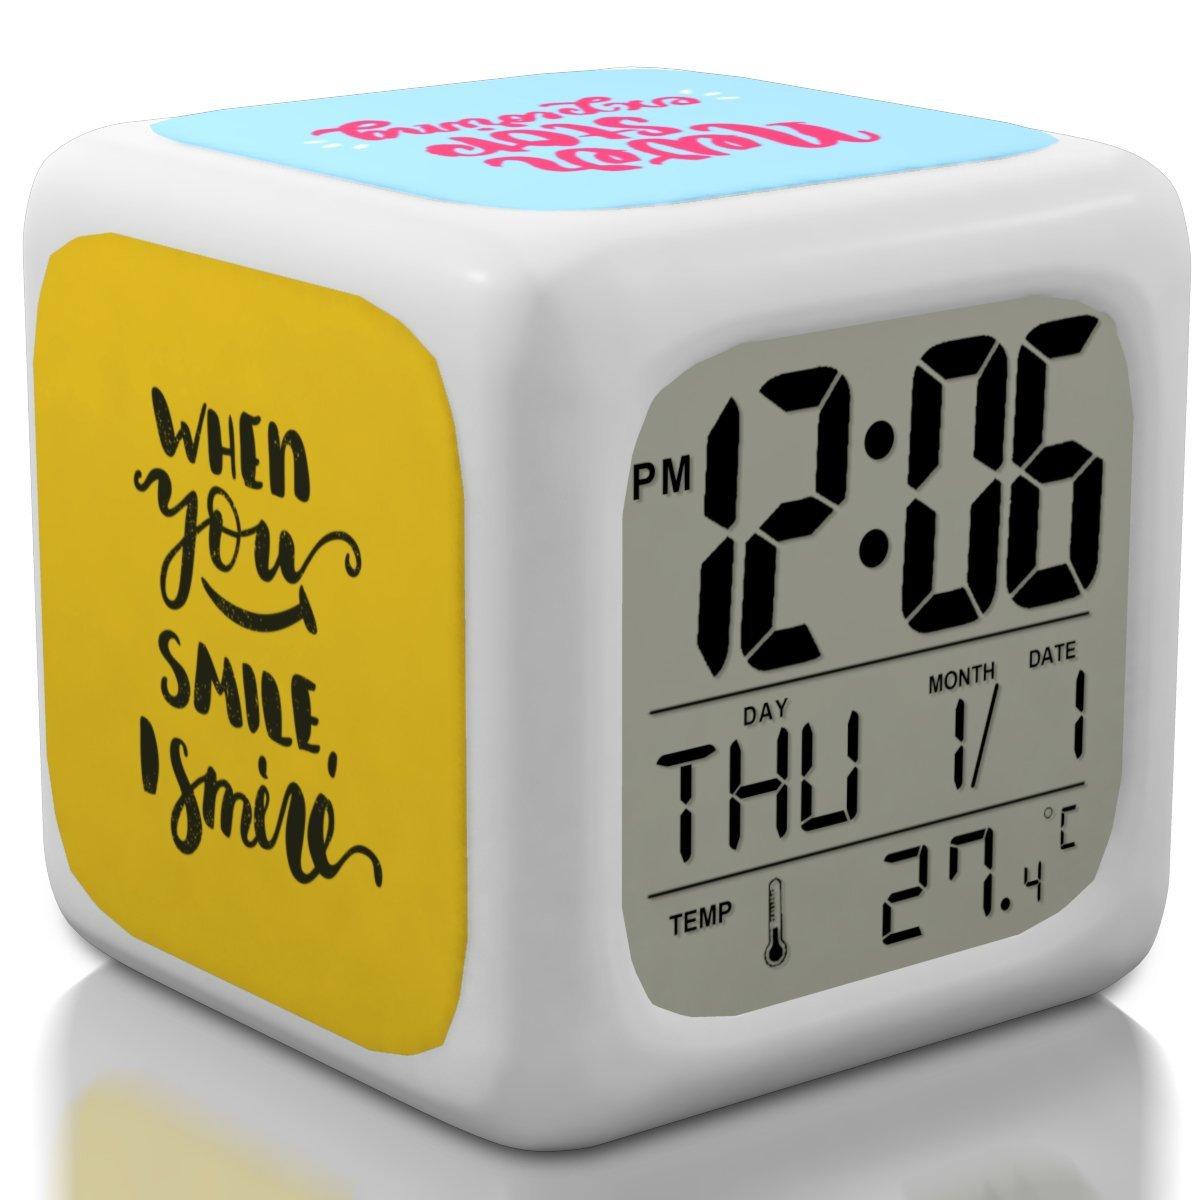 Alarm clocks for teen girls, hot girls sex party